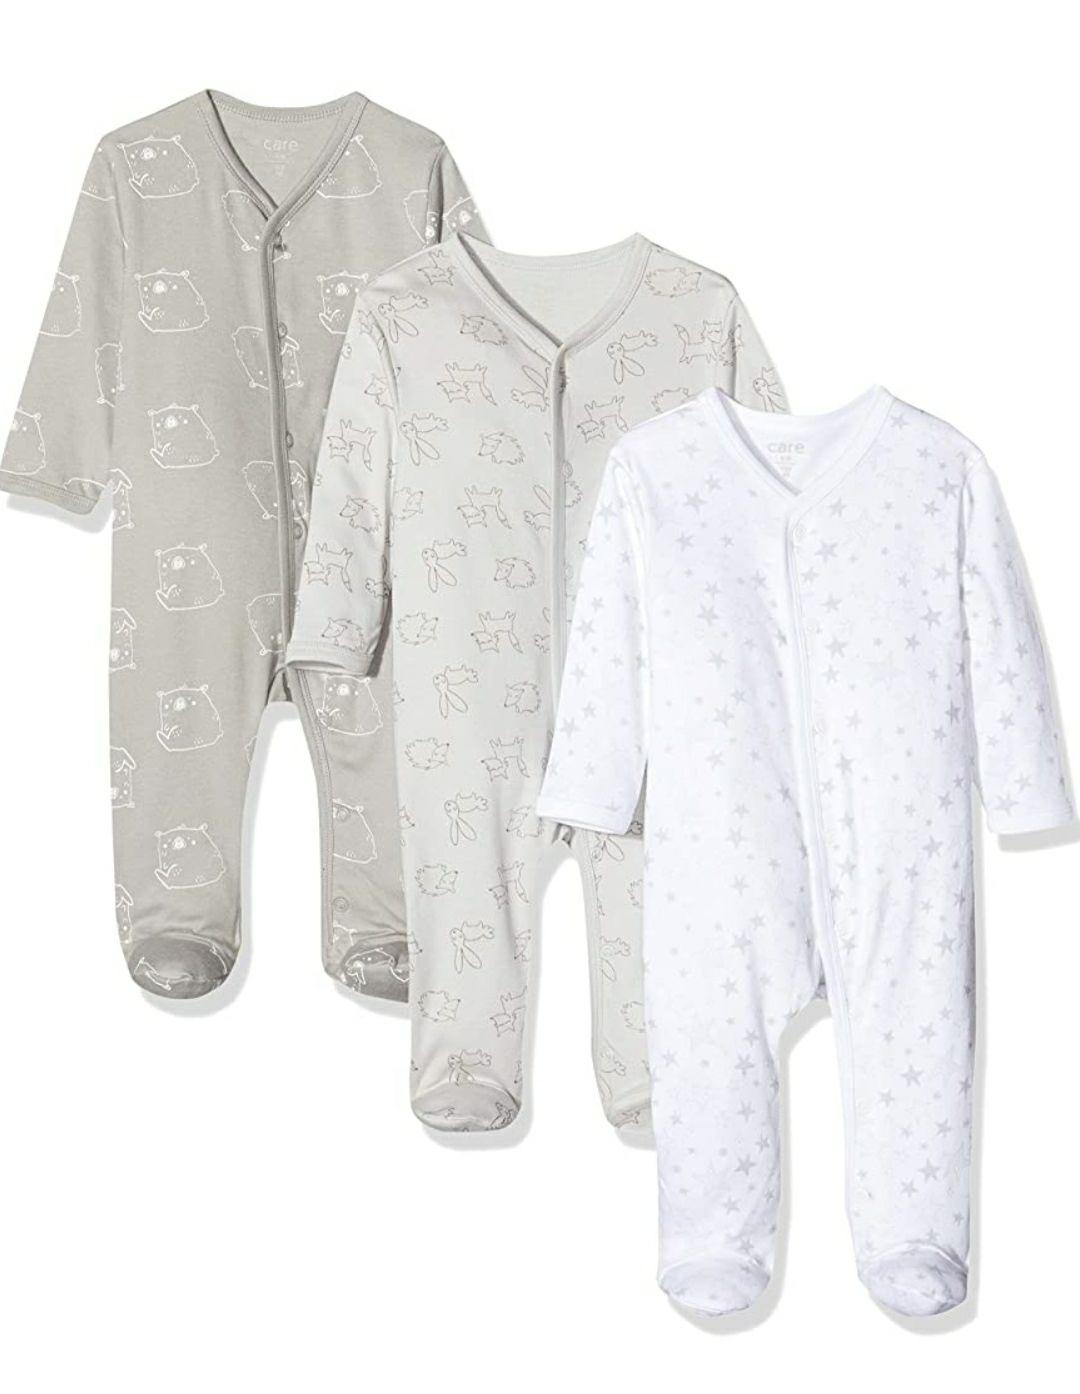 TALLA 56 - Marca Care 550267 - Monos Unisex bebé